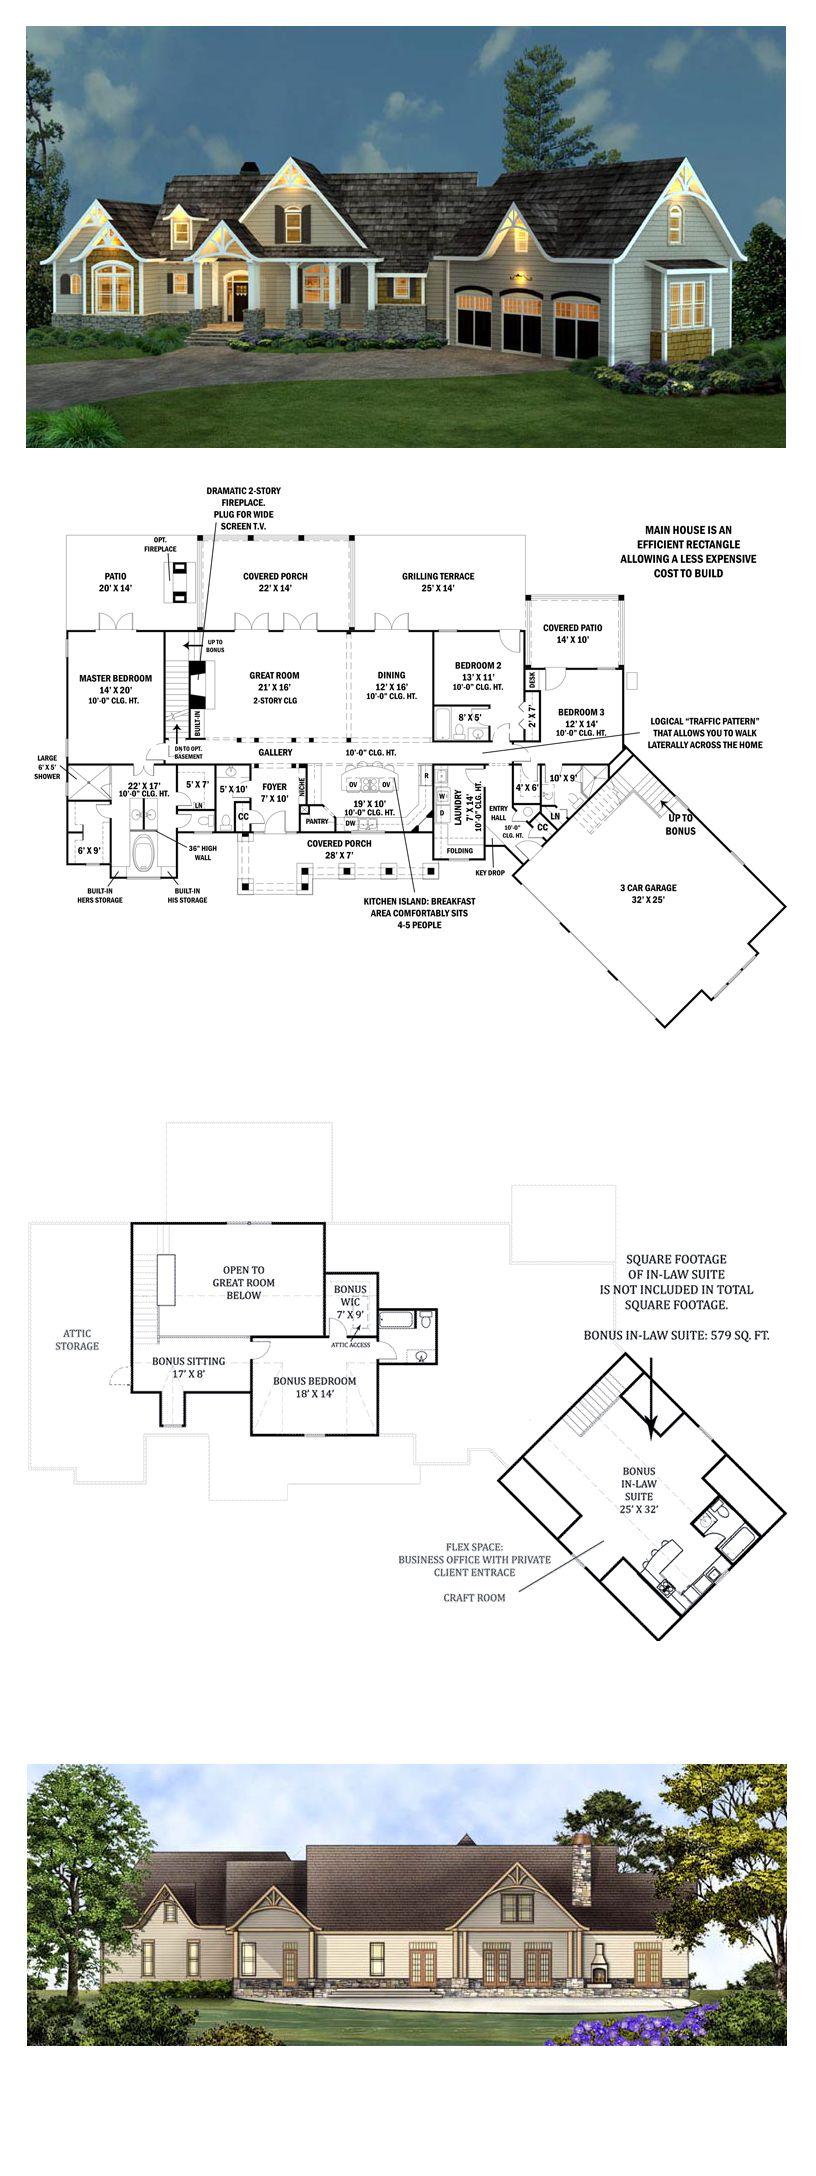 Country Craftsman Traditional Tudor House Plan 98267 | Cedar shakes ...